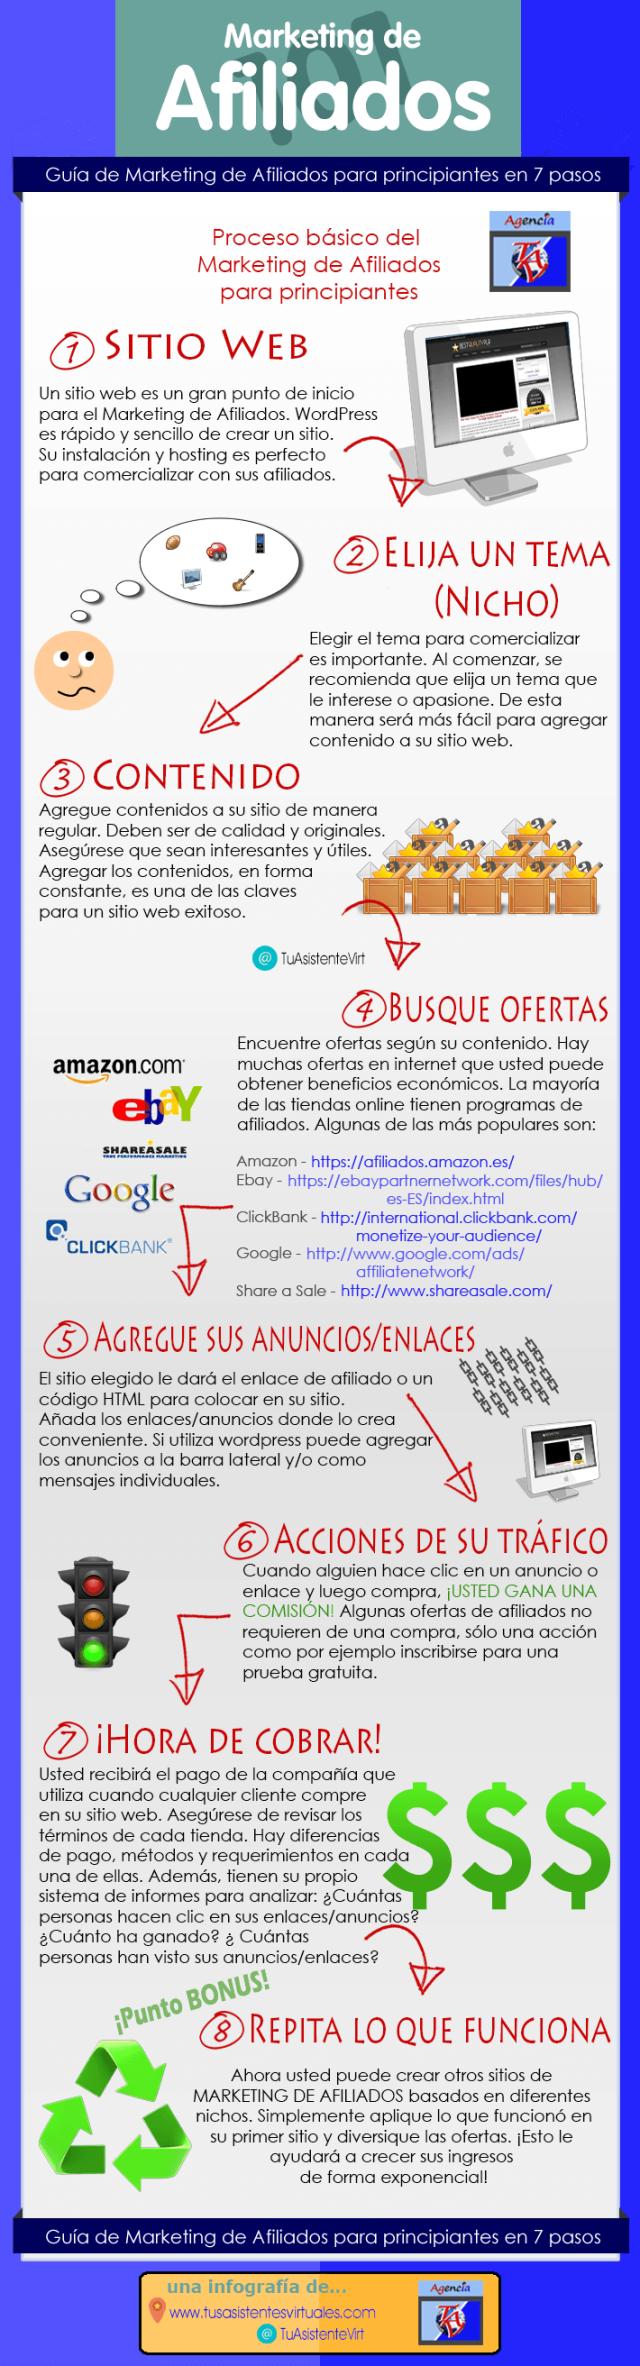 Guía de marketing de afiliación en 7 pasos